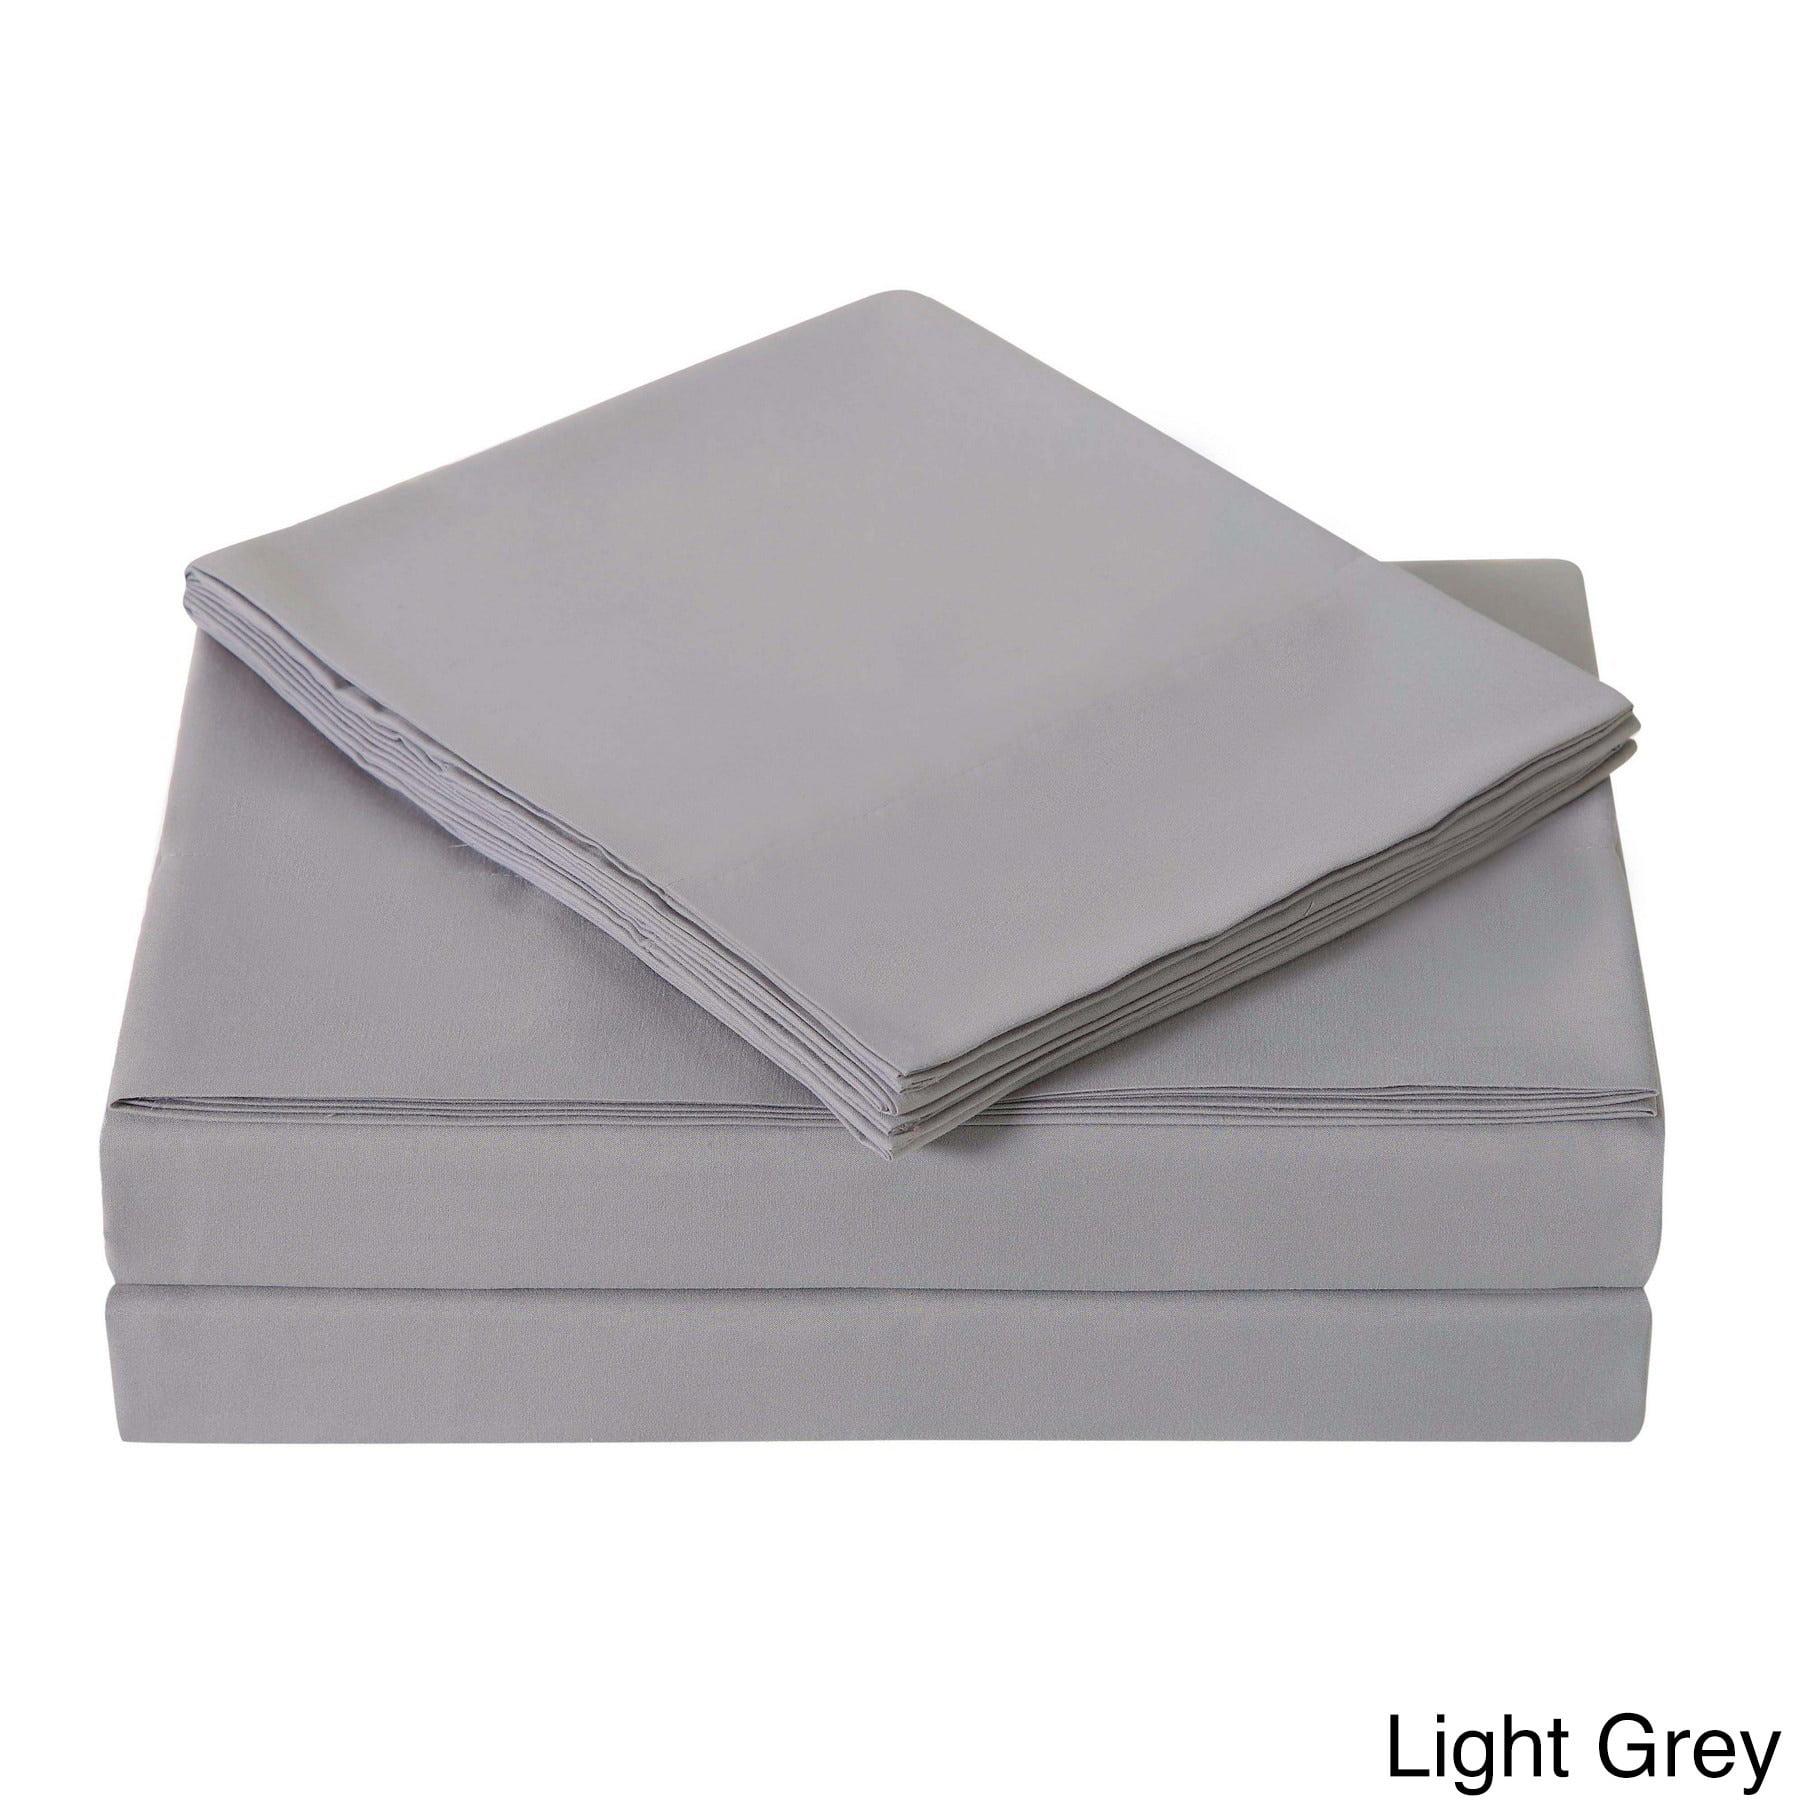 London Fog Solid Ash Light Gray Bedding Sheet Set Walmart Com